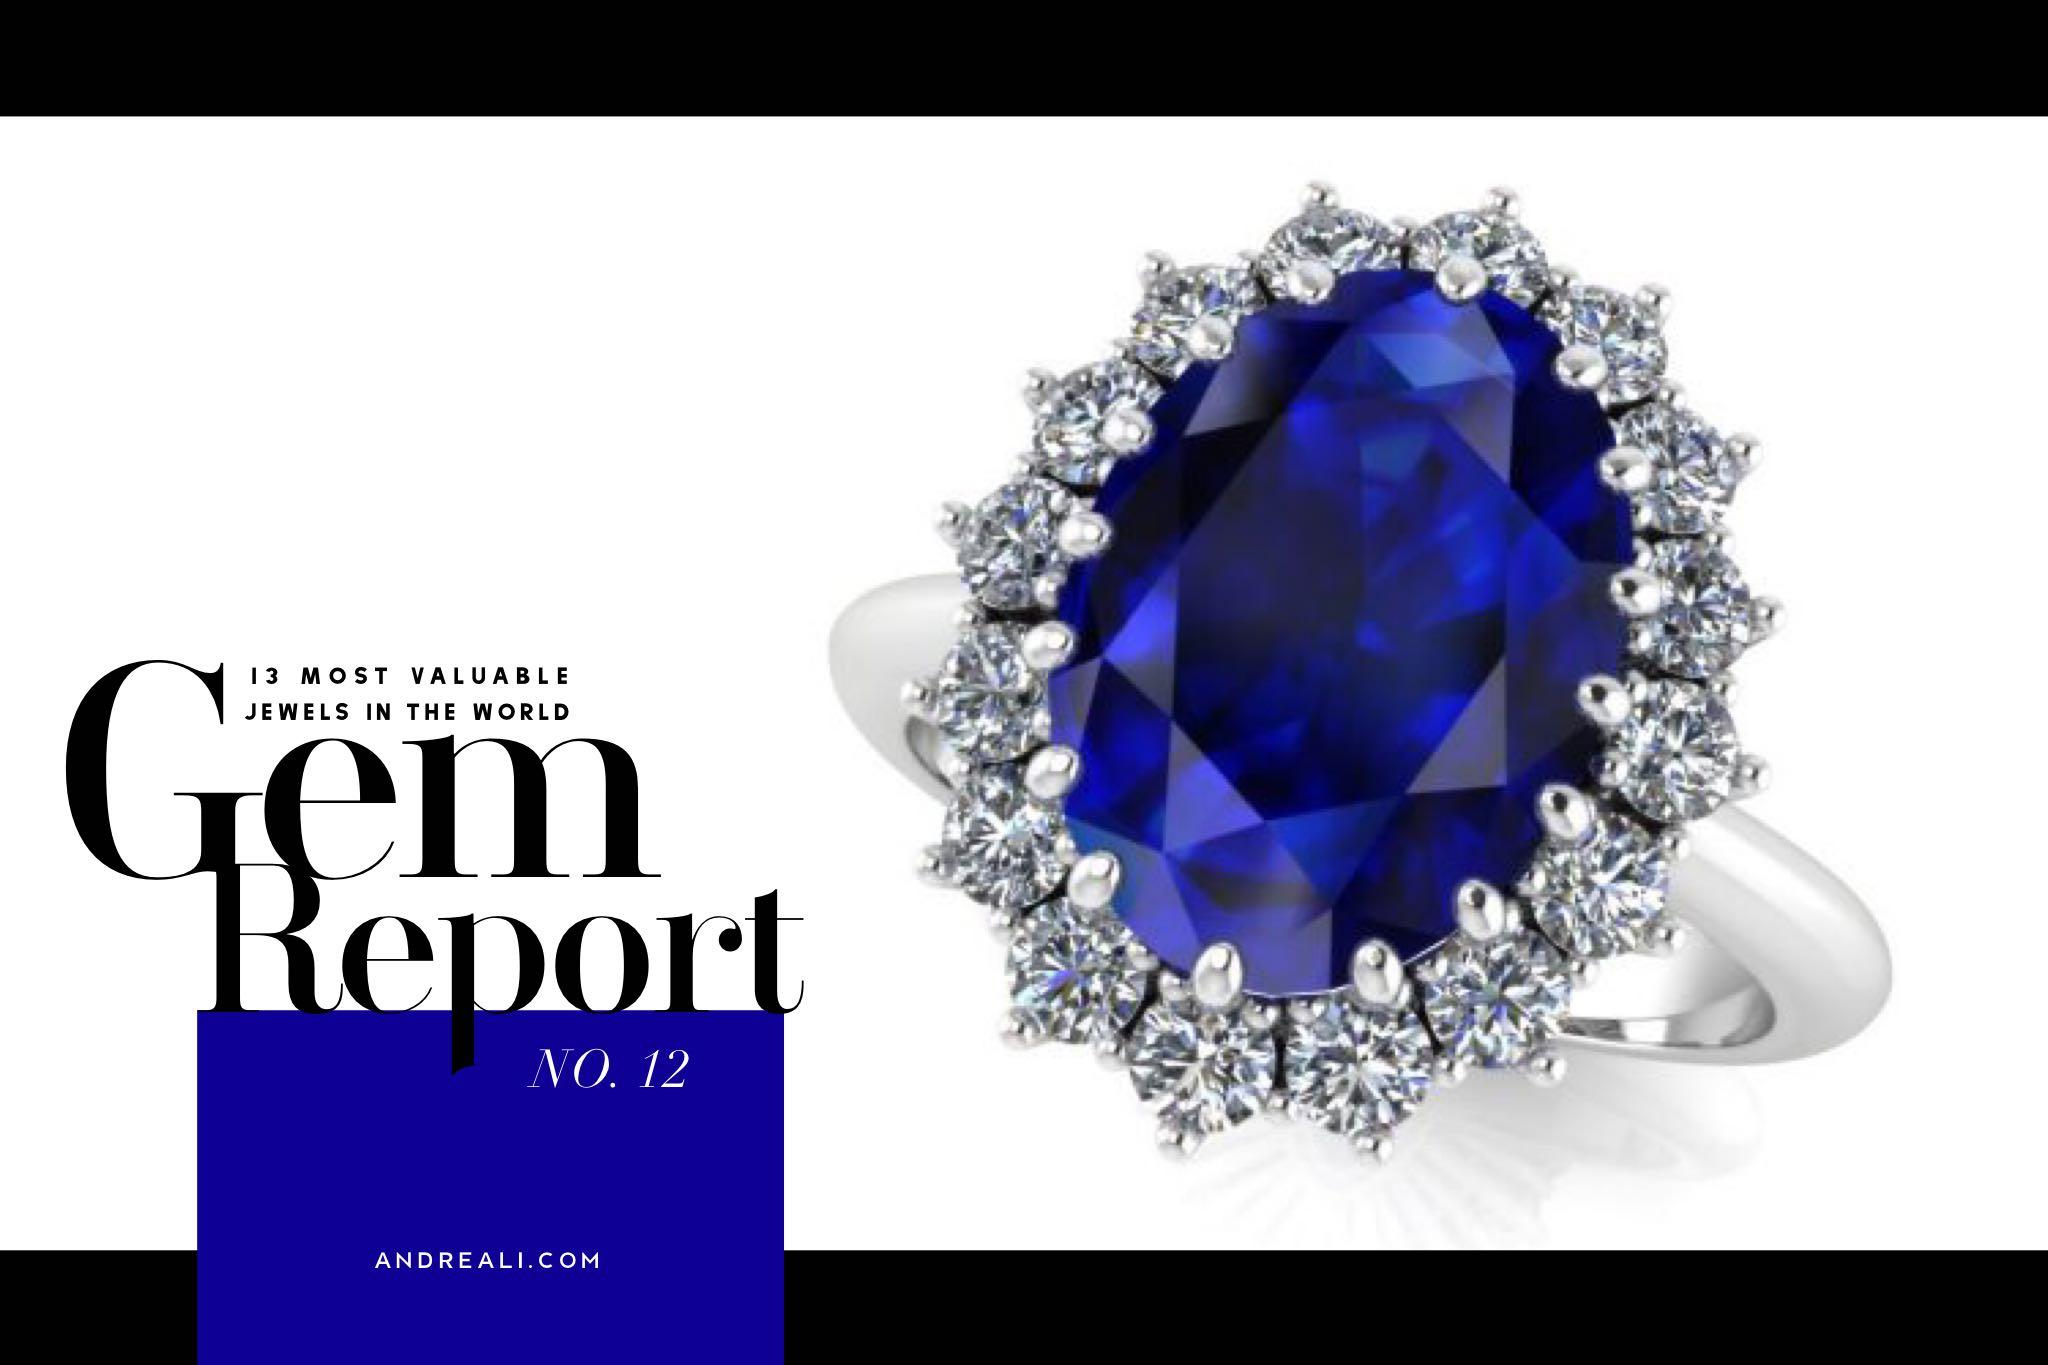 princess-diana-sapphire-engagement-ring.jpeg